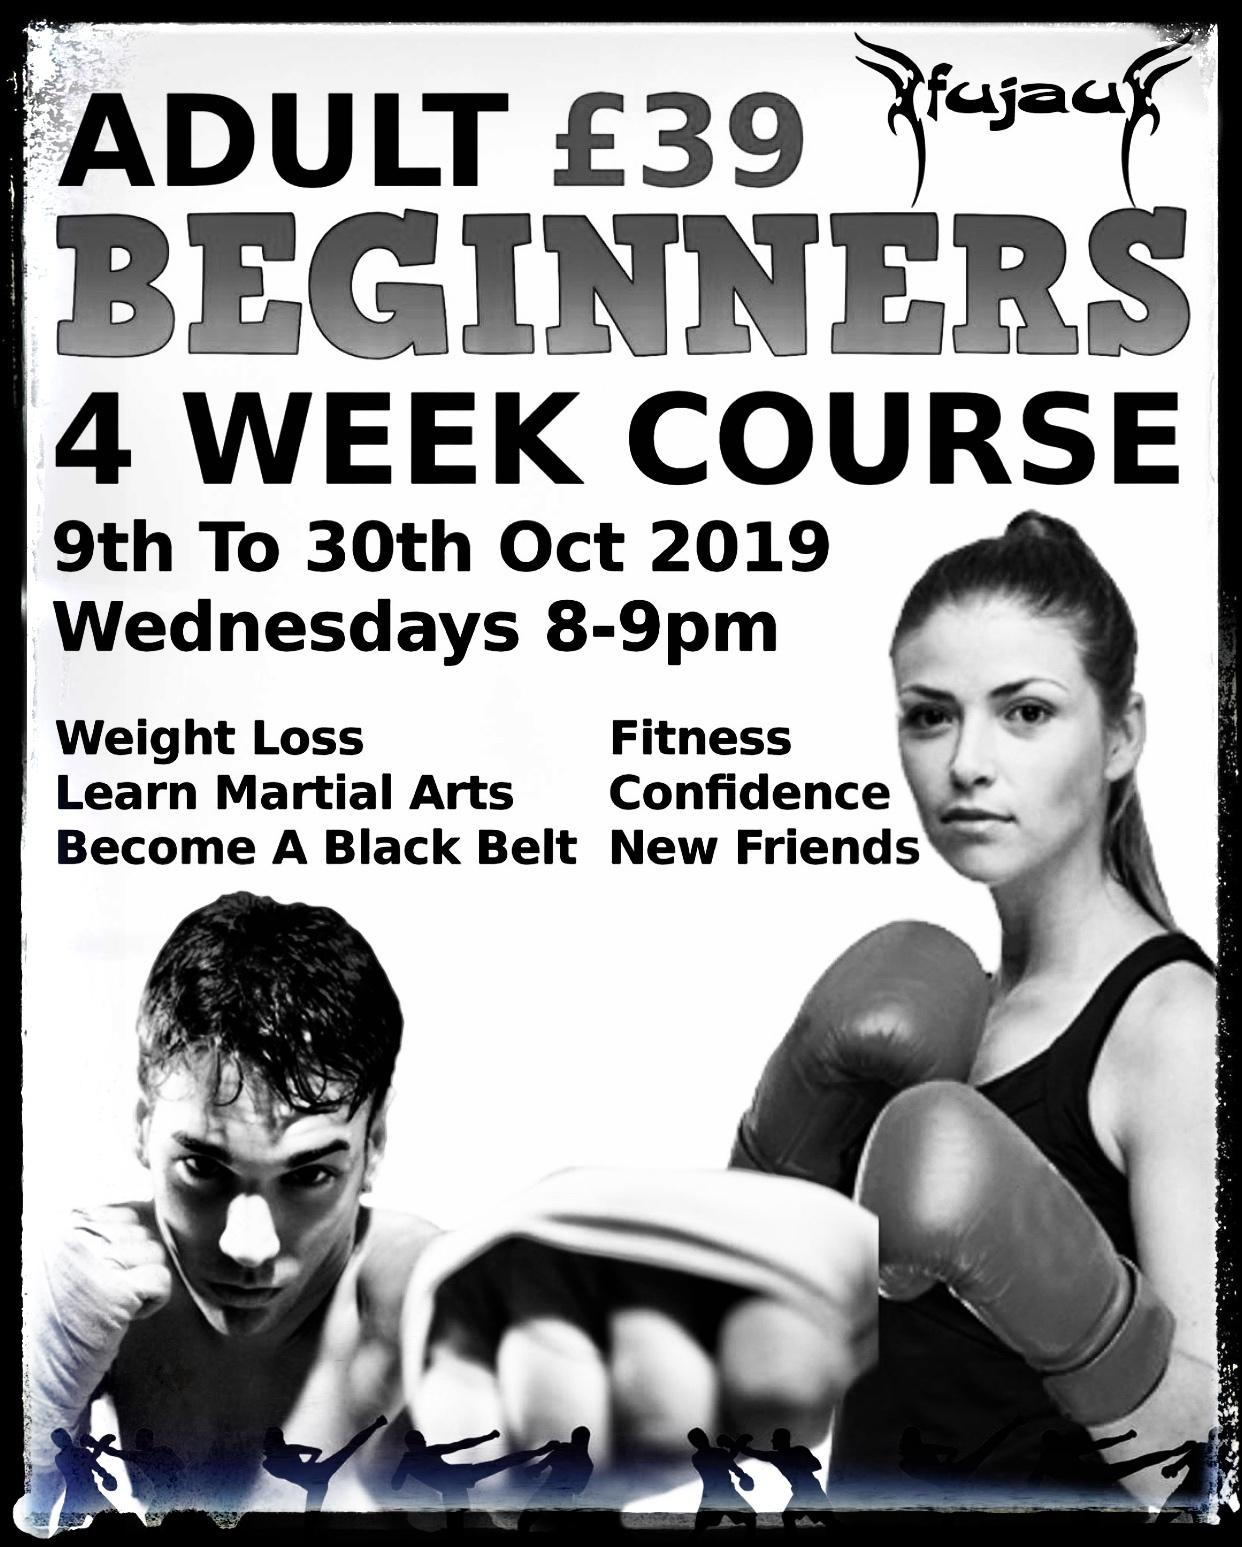 Beginner Kickboxing / Muay Thai / Beginner Martial Arts Course in Slough Starting 9th Oct 2019